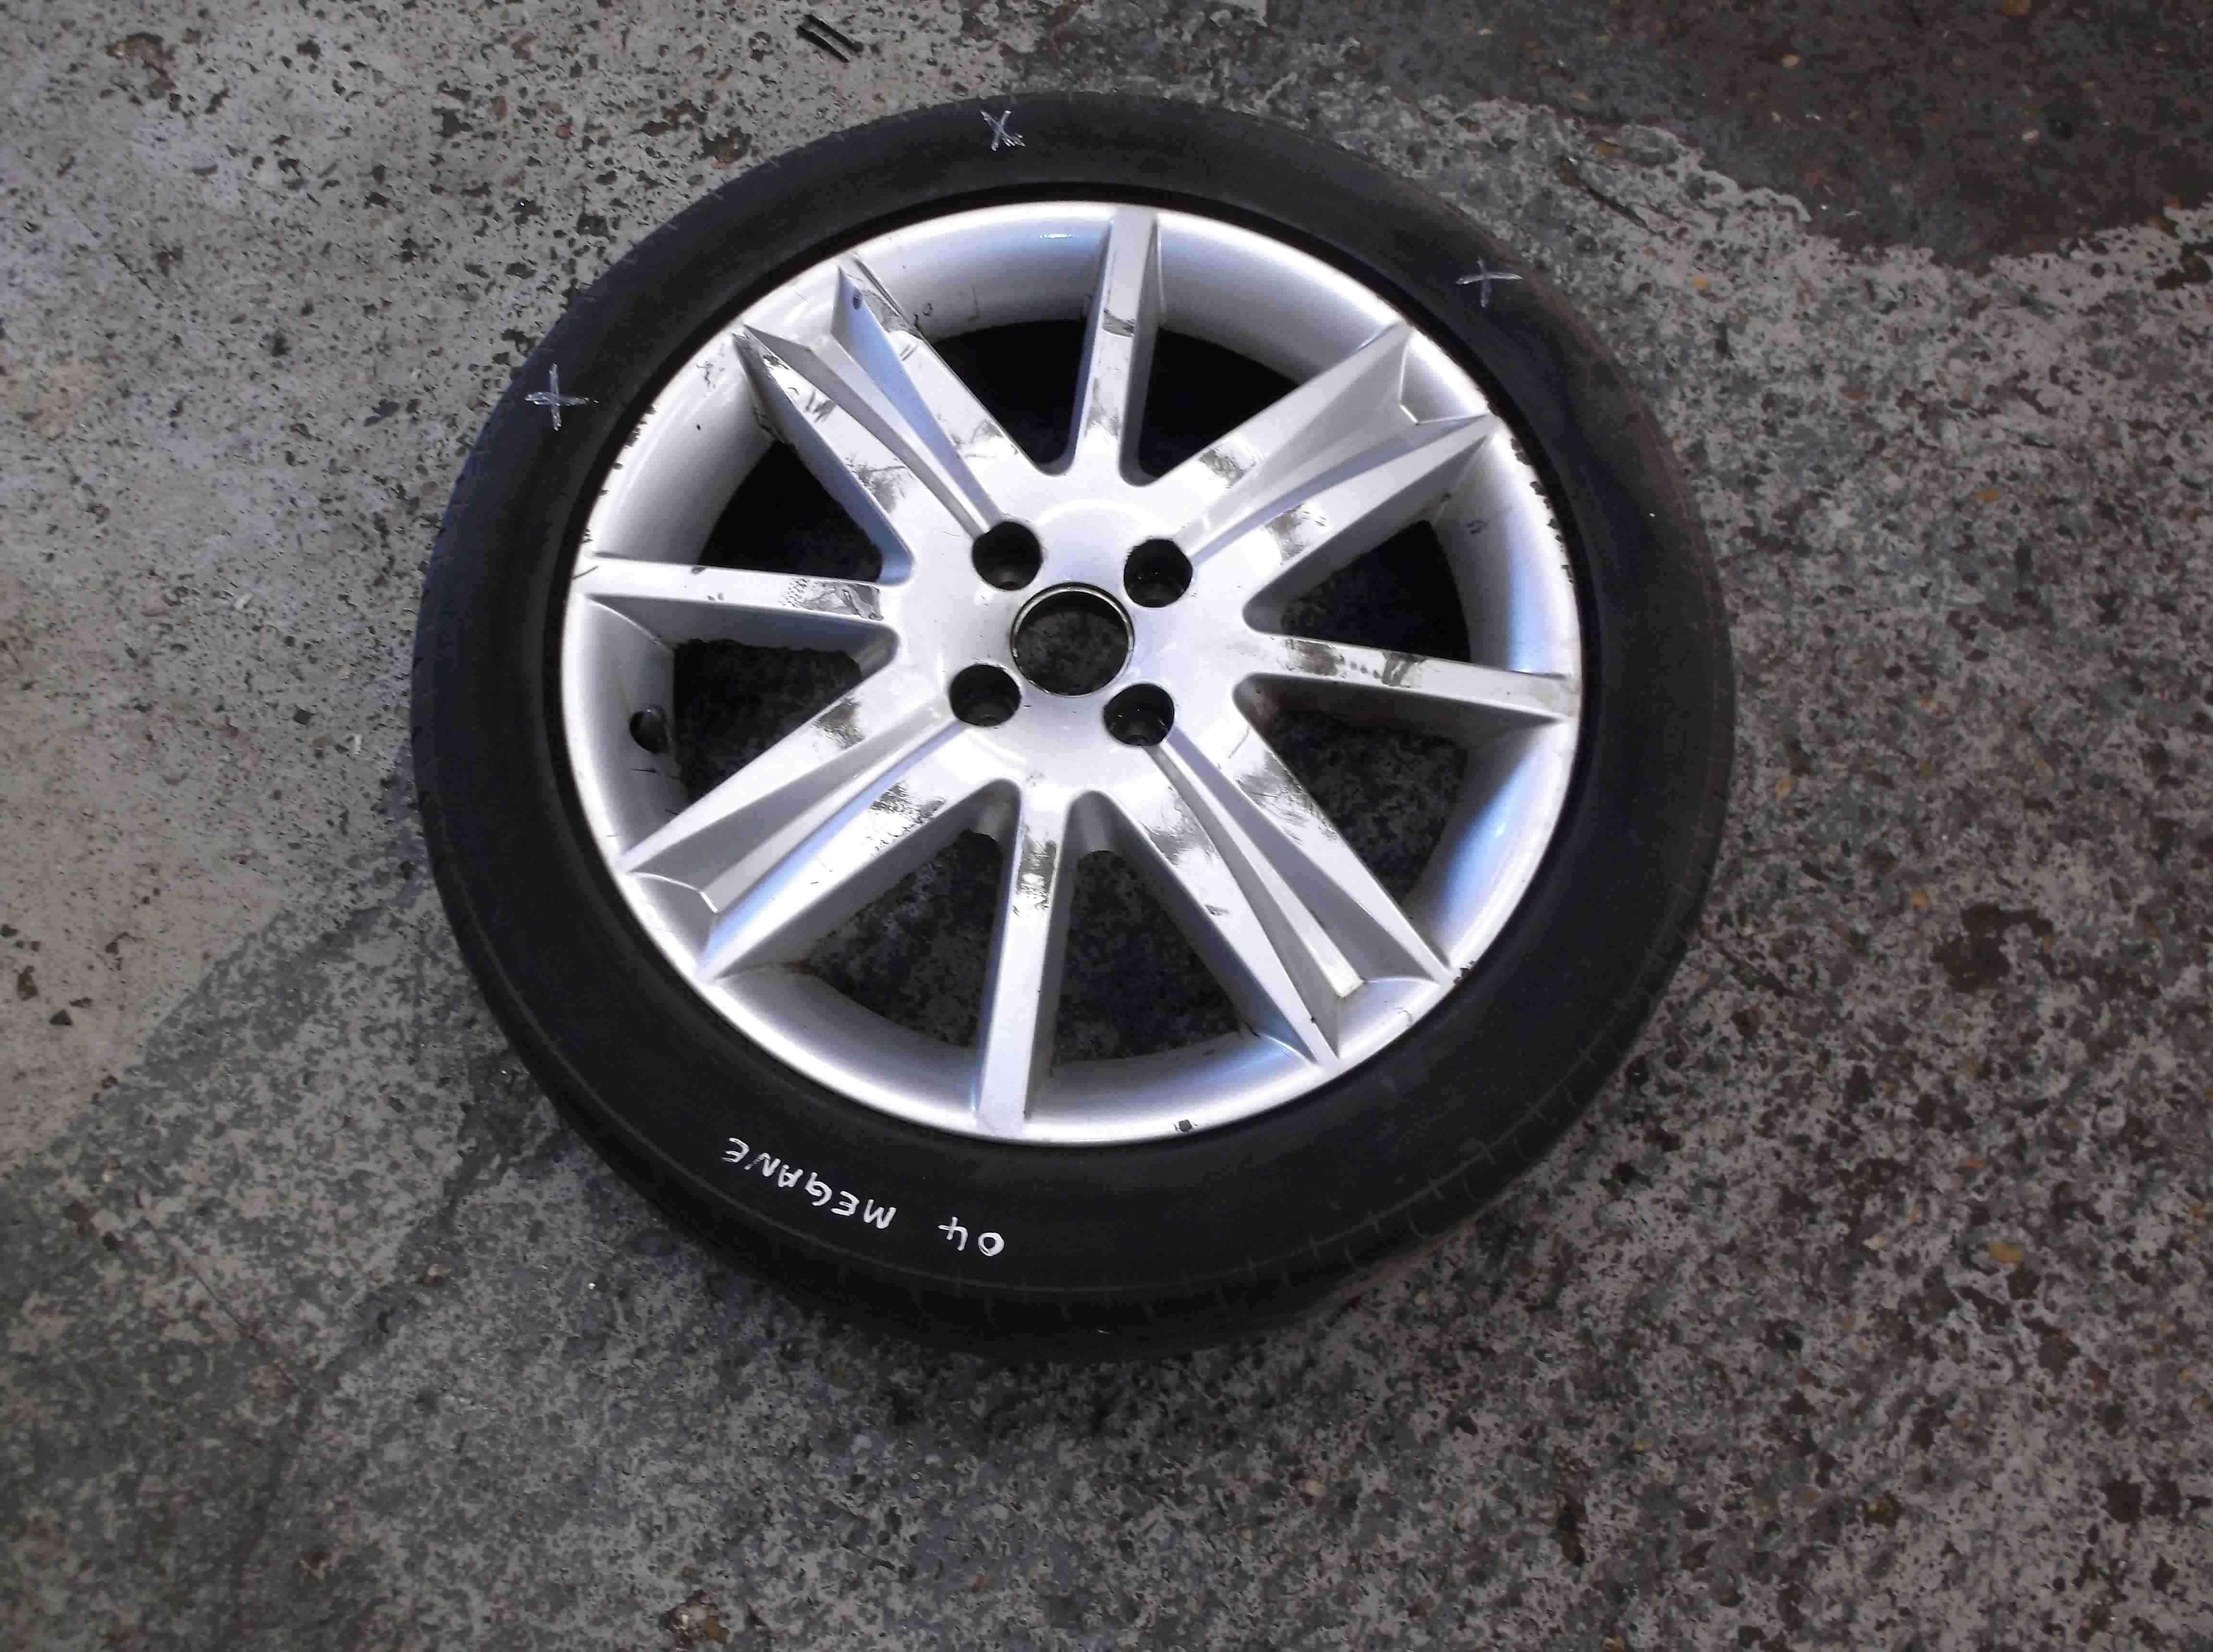 Renault Megane 2002-2008 17 inch Alloy wheel Nervasport x1 3/5